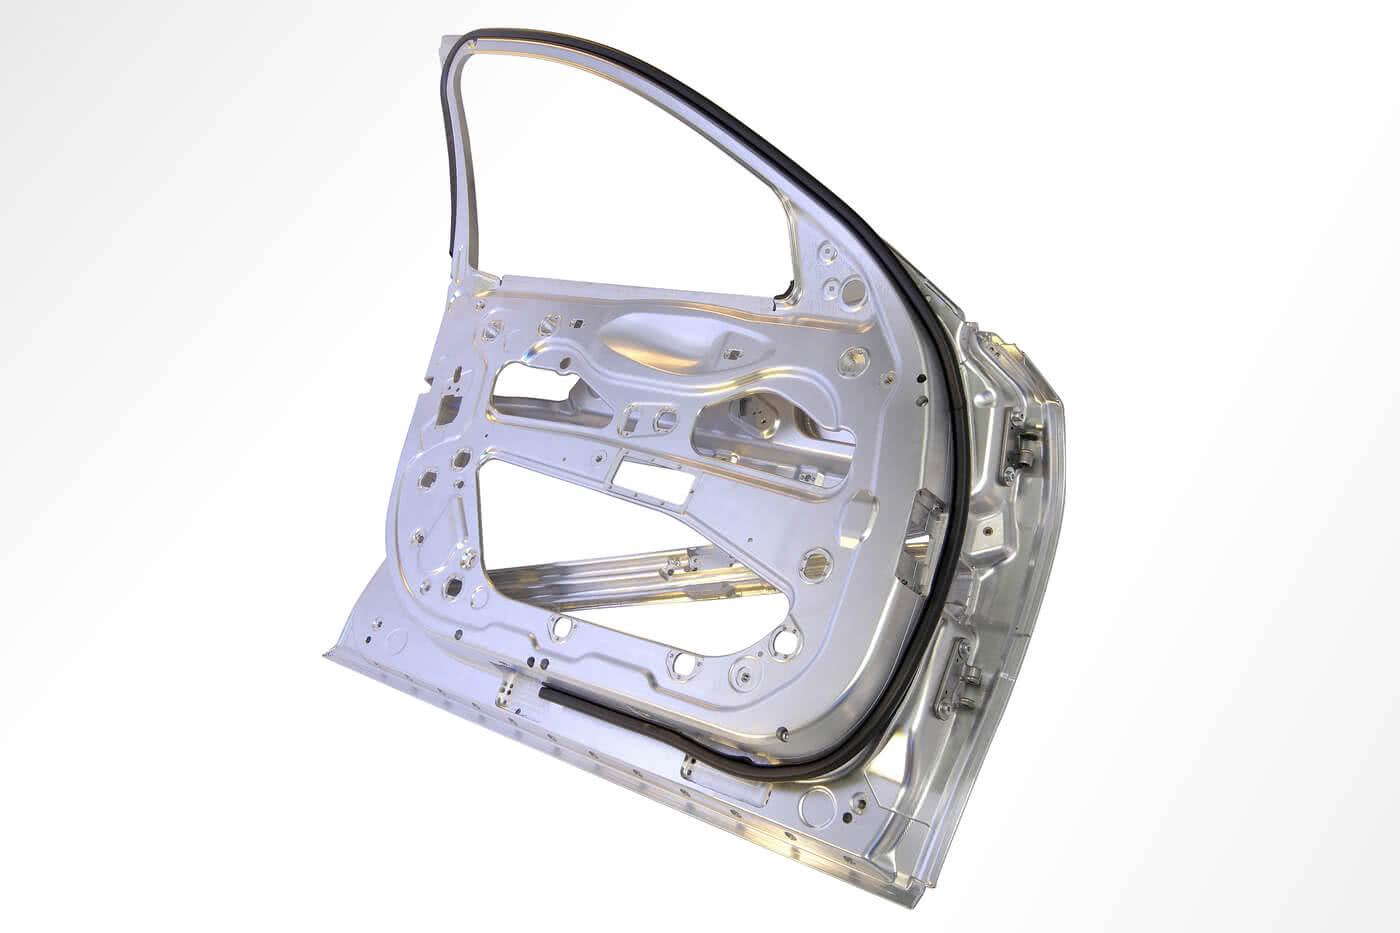 Laro NC cubing modell automotive.jpg